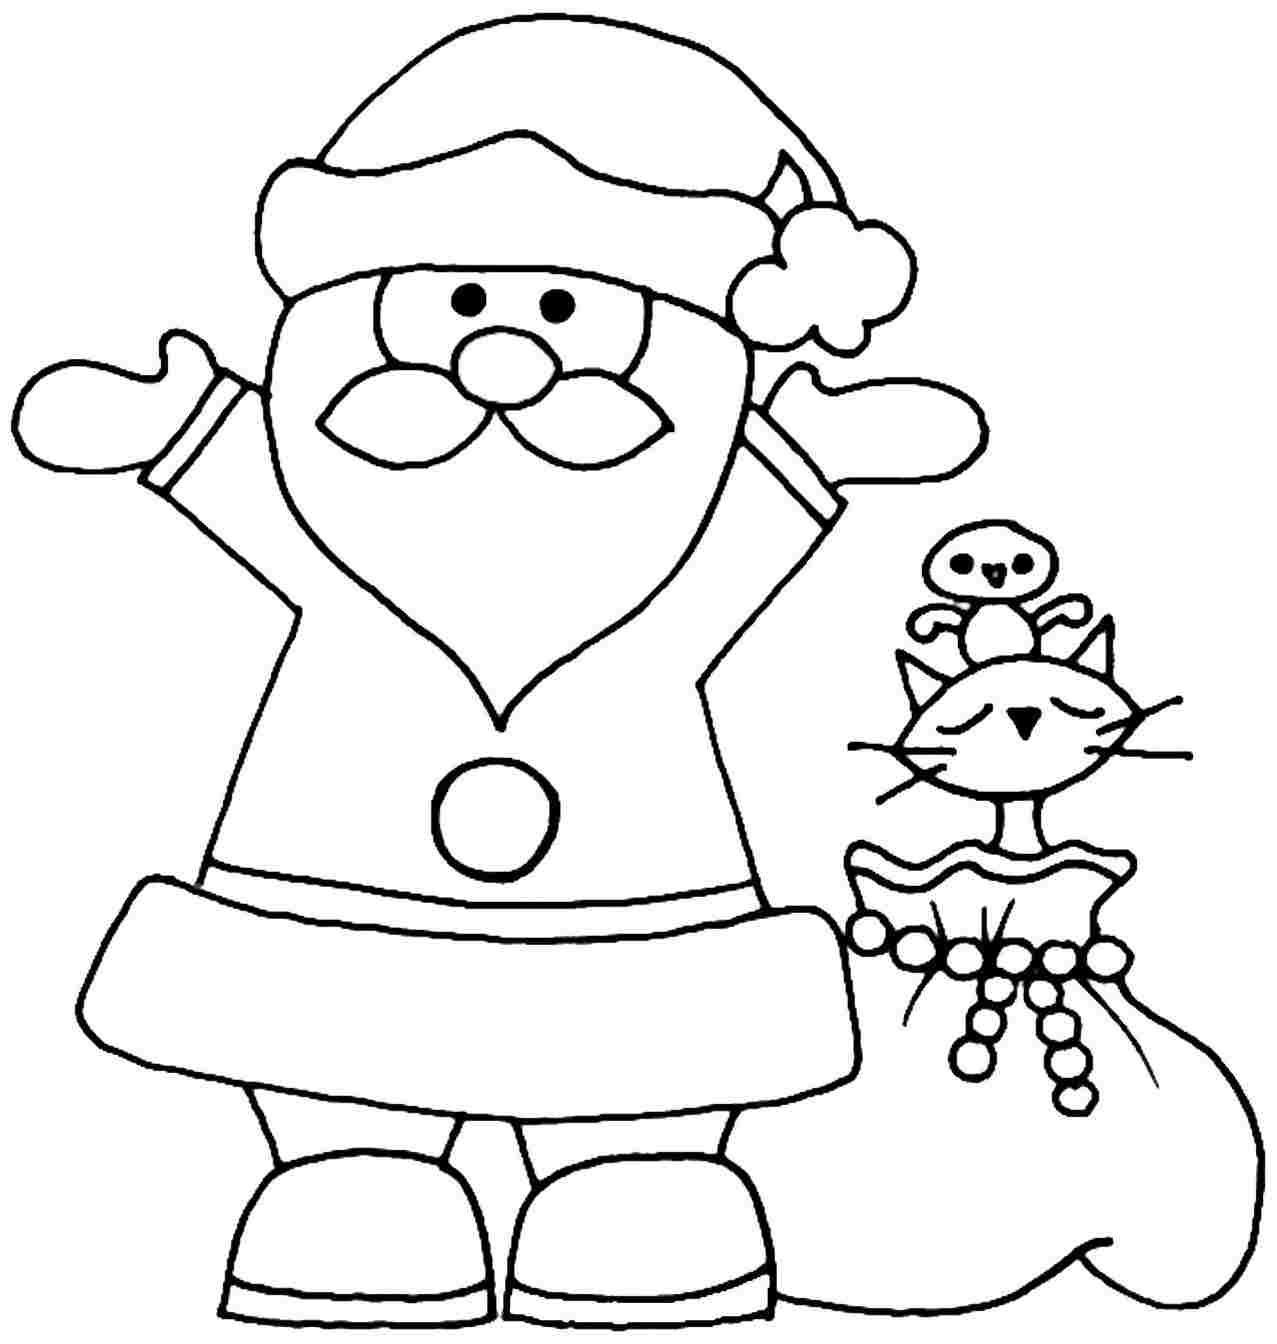 Santa Claus Drawing Easy At Getdrawings